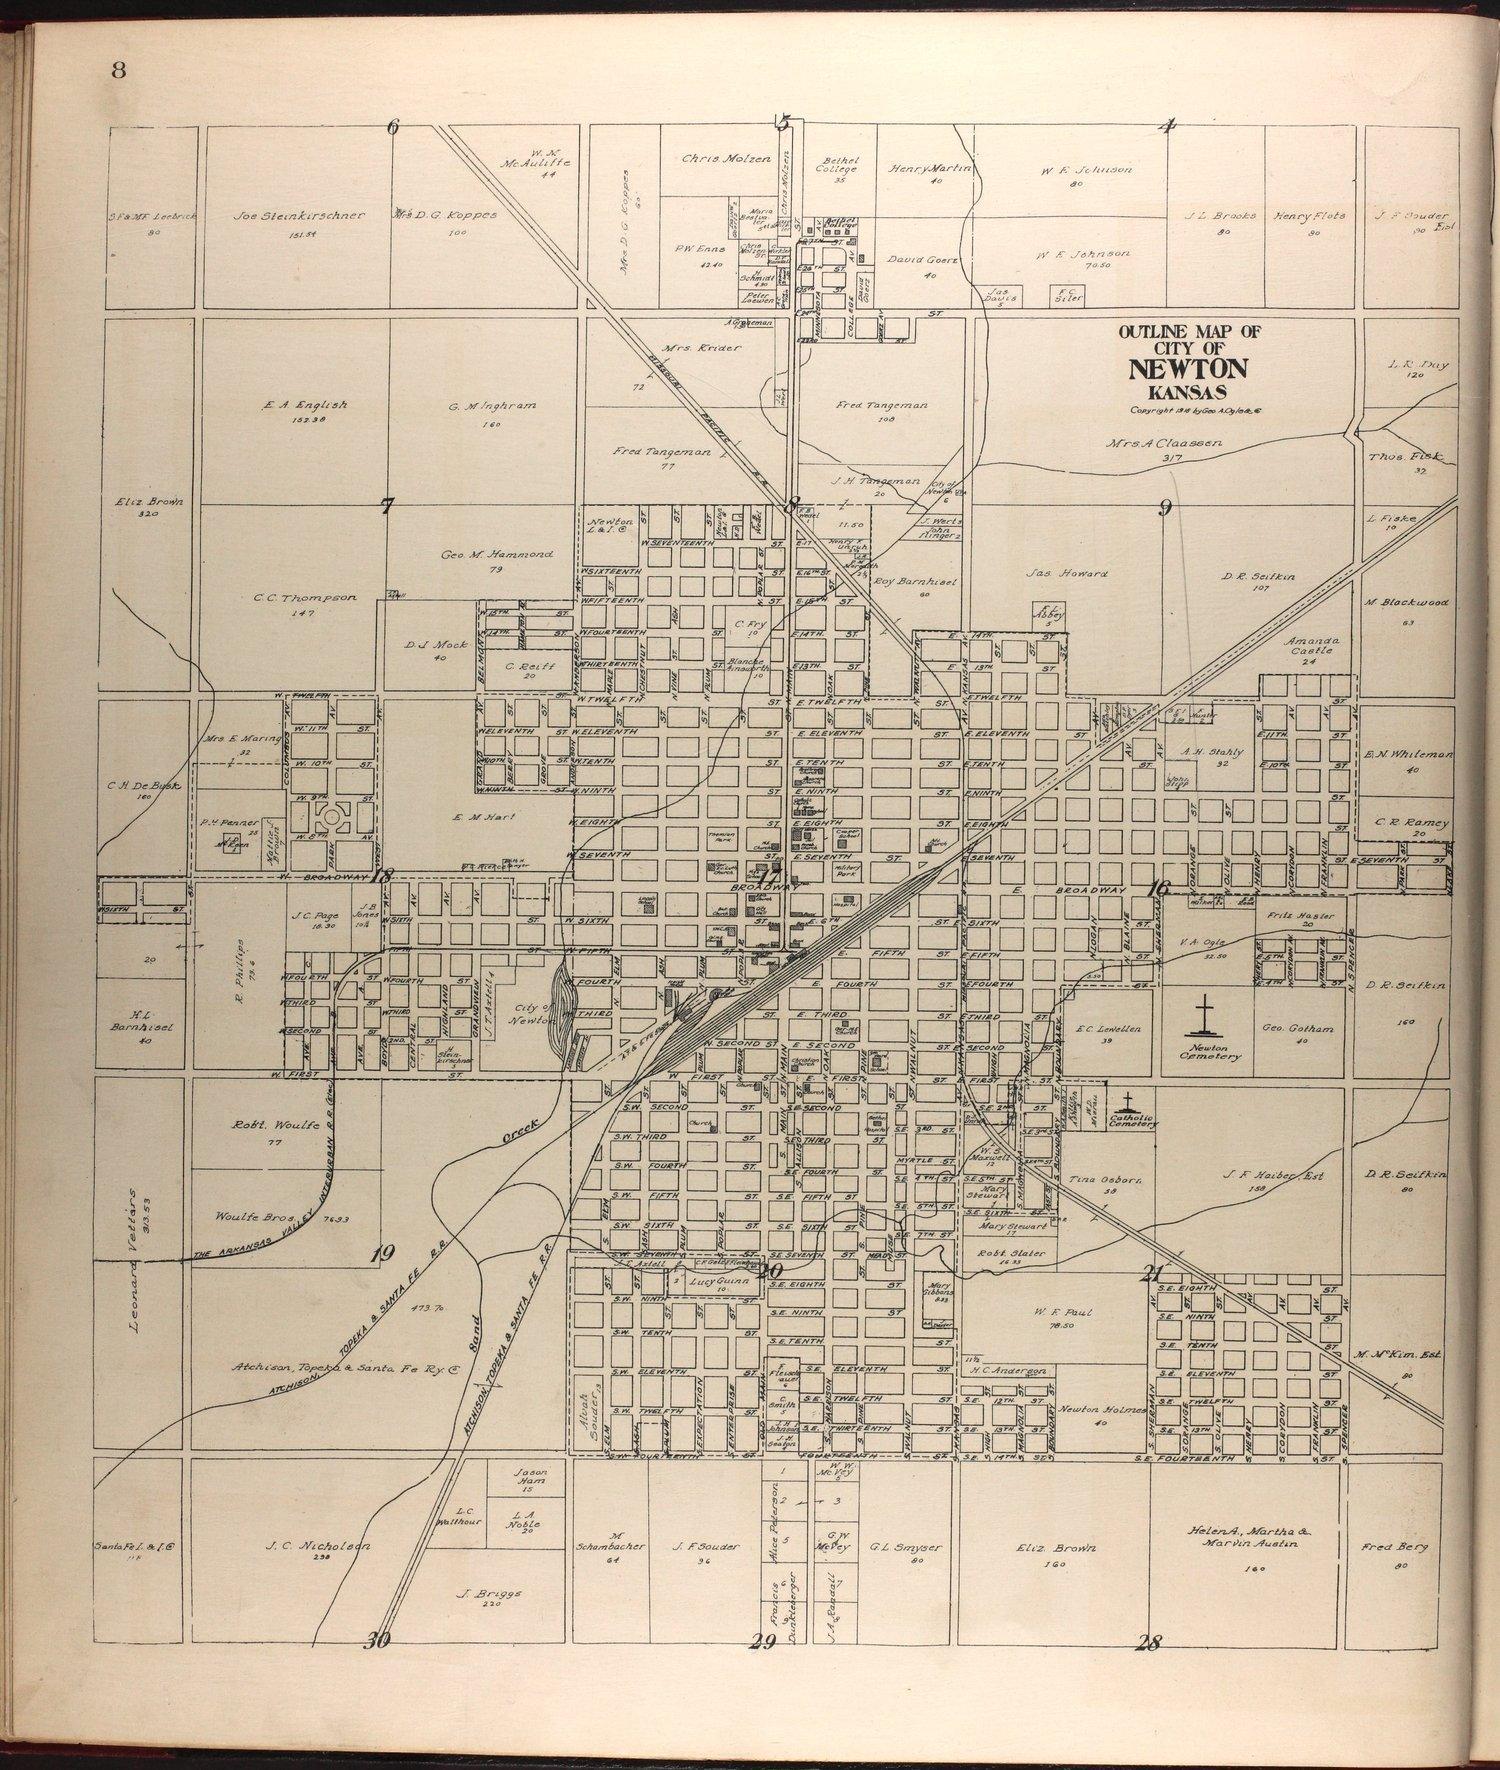 Standard atlas of Harvey County, Kansas - 8